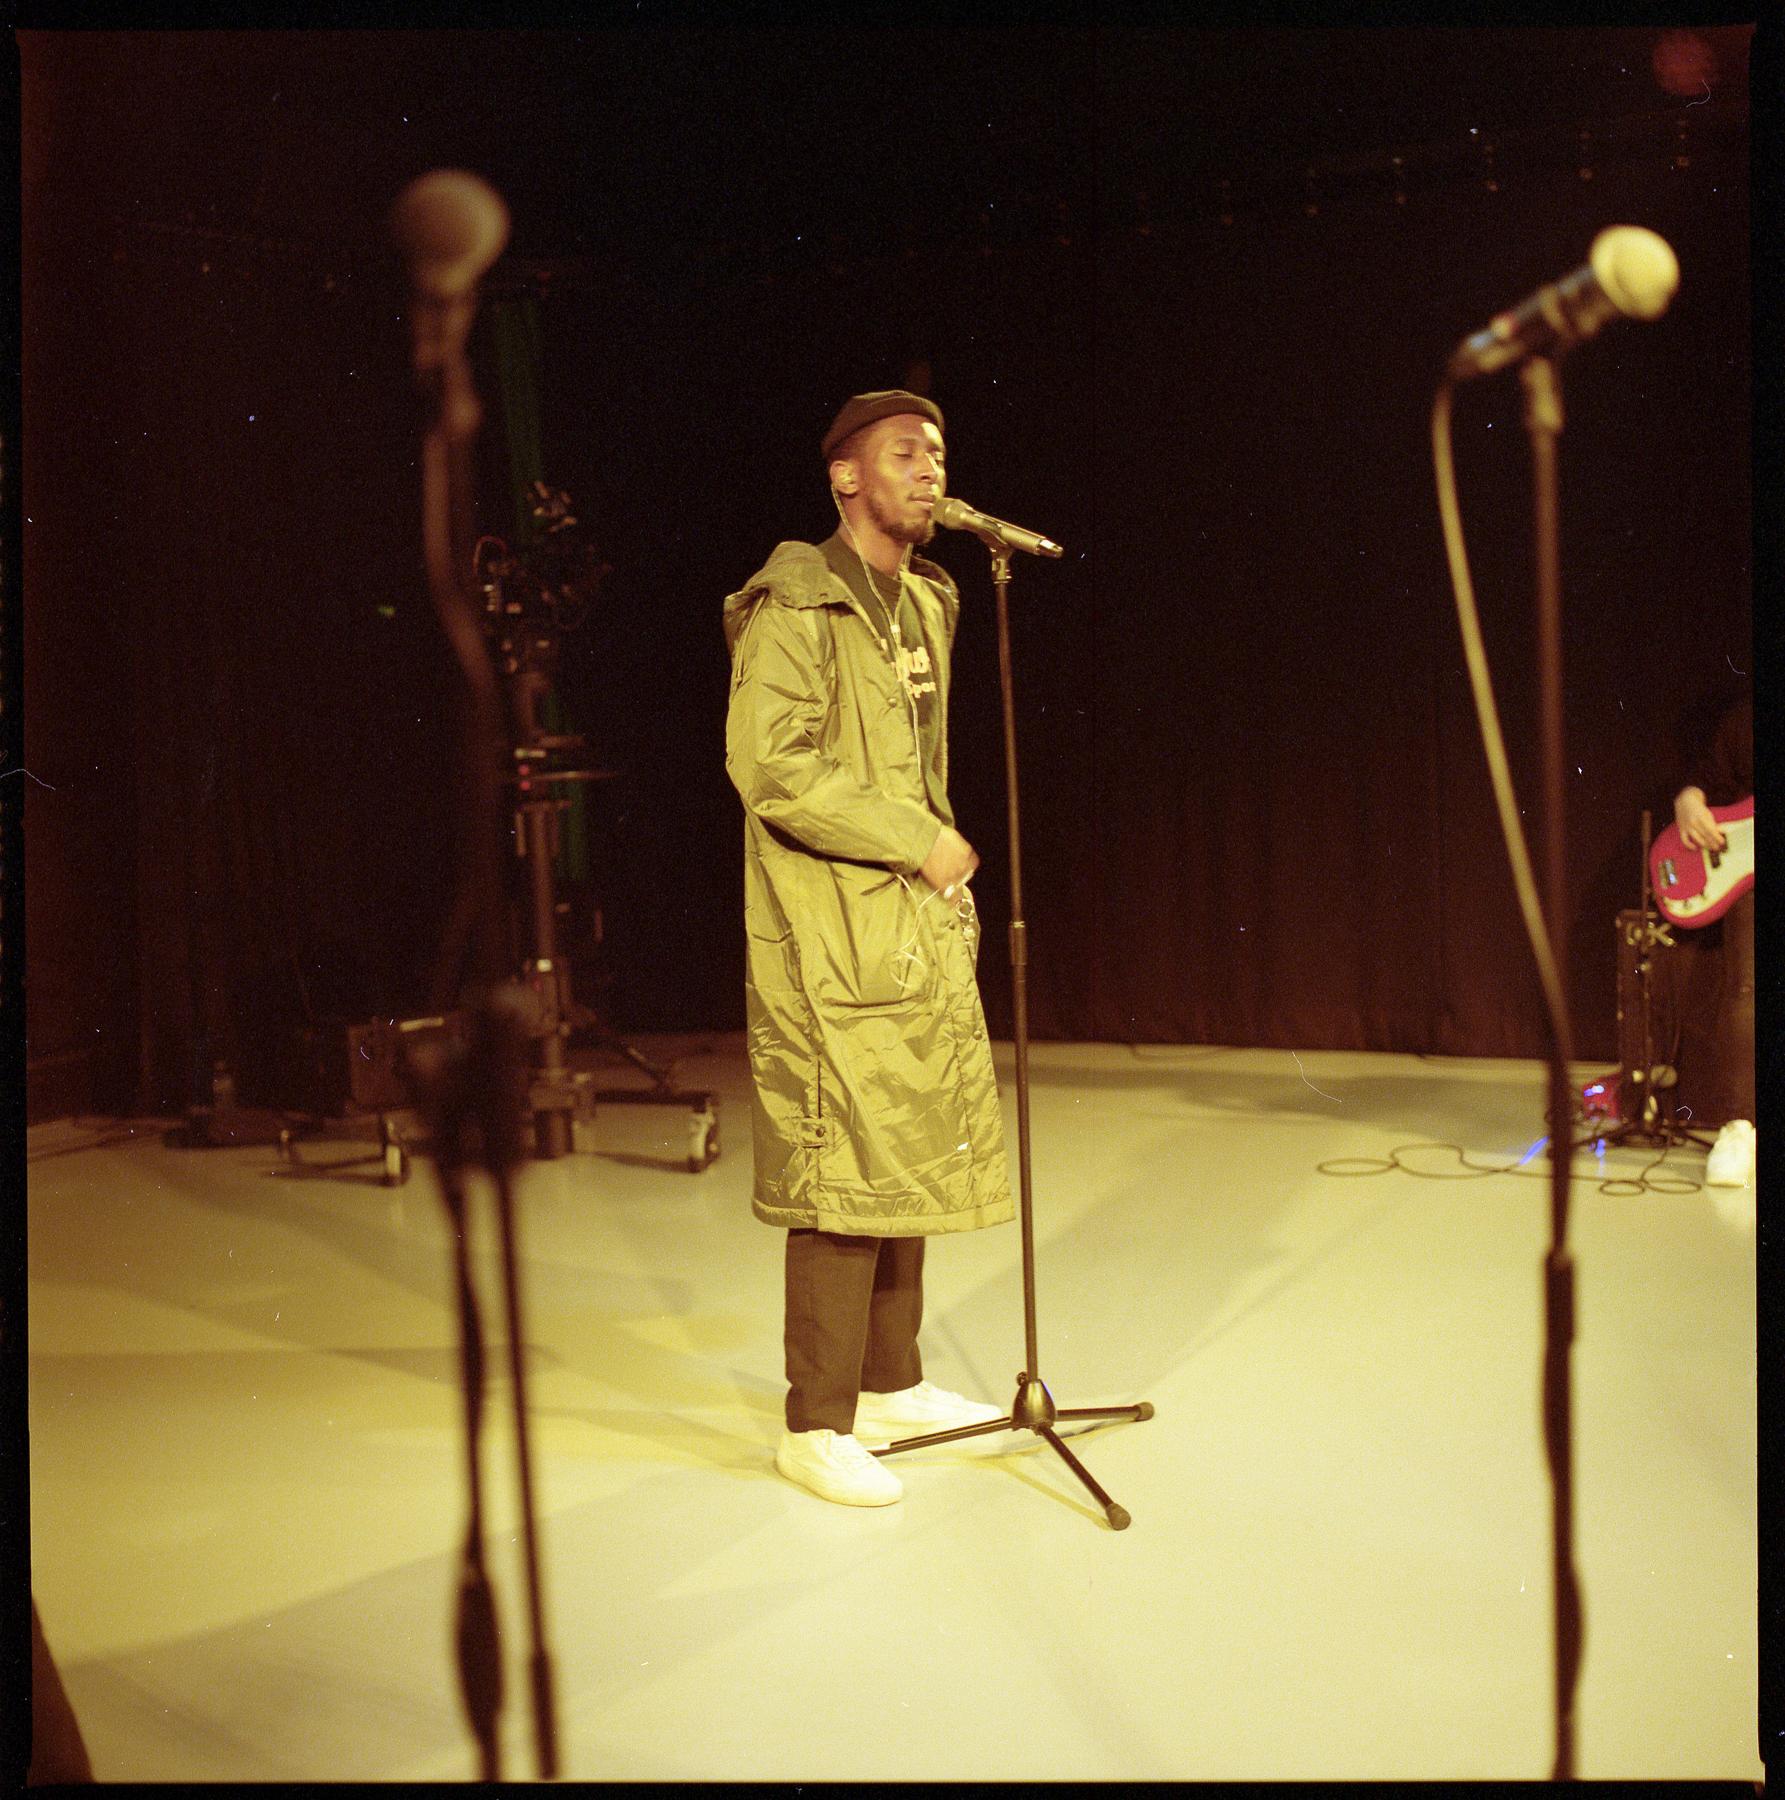 SammHenshaw-YouTubeSpace-portra-22.01.19-7.jpg